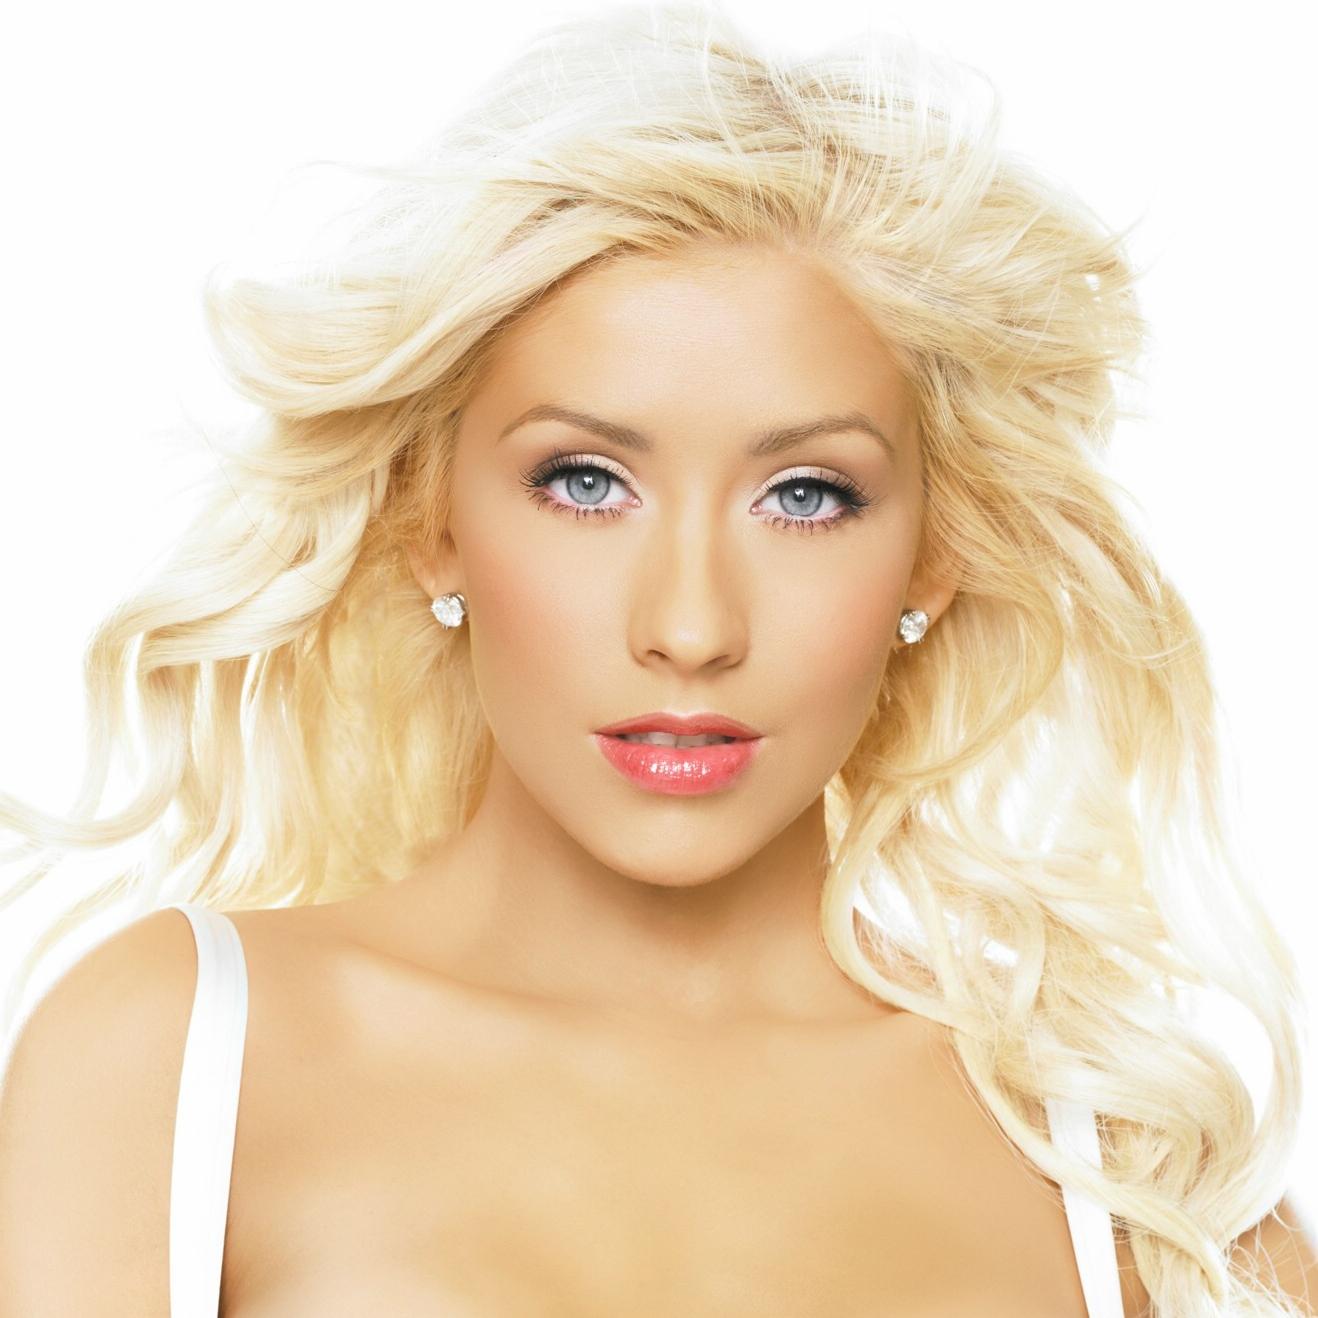 Christina Aguilera Nude: Celeb Porn Videos #675